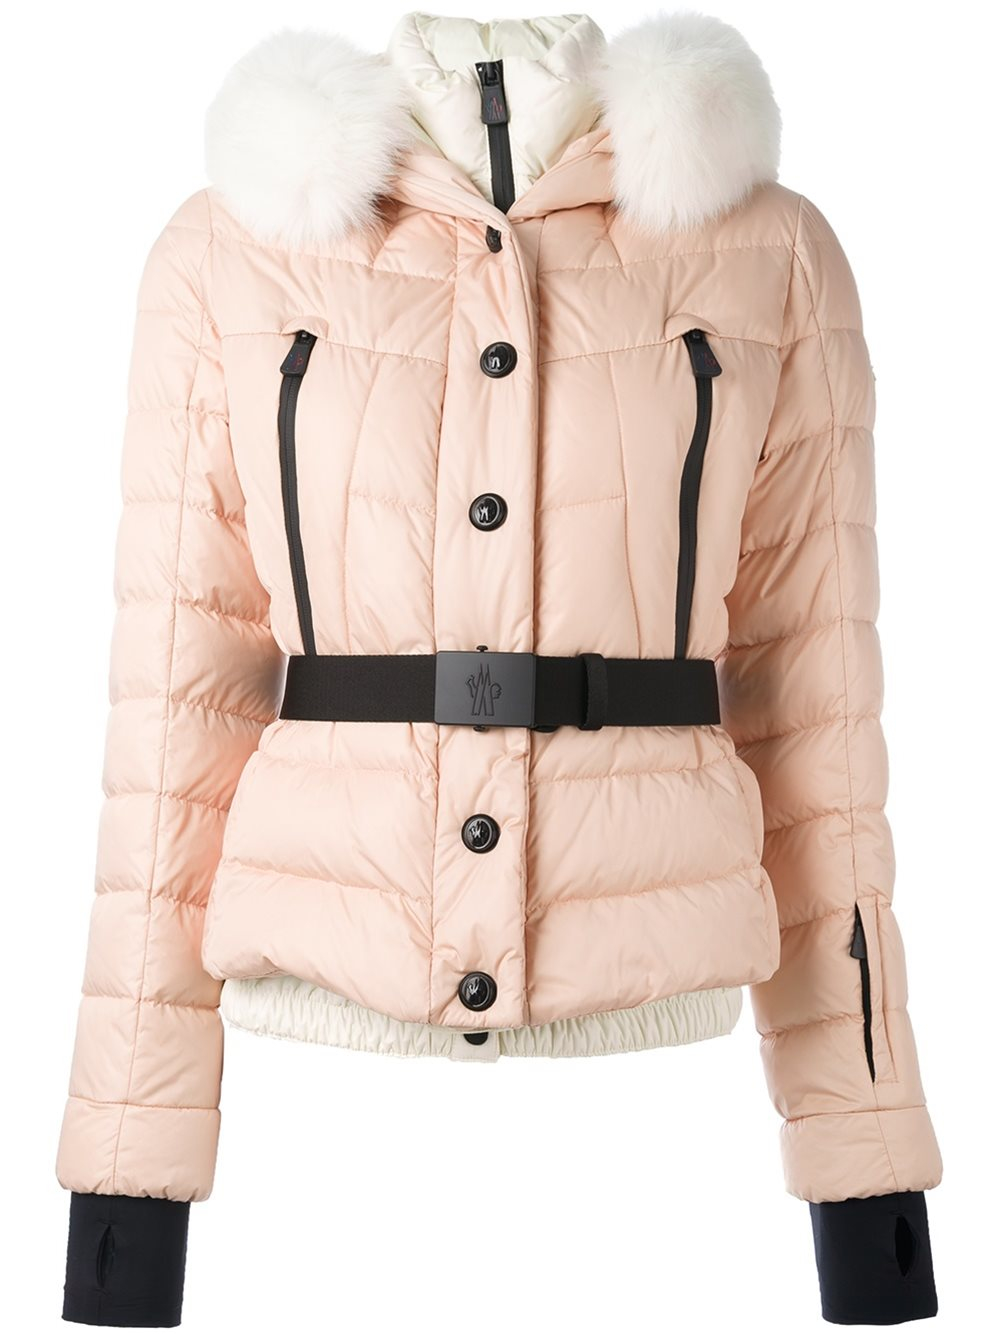 03a295f9d7d8 Lyst - Moncler Grenoble  beverly  Jacket